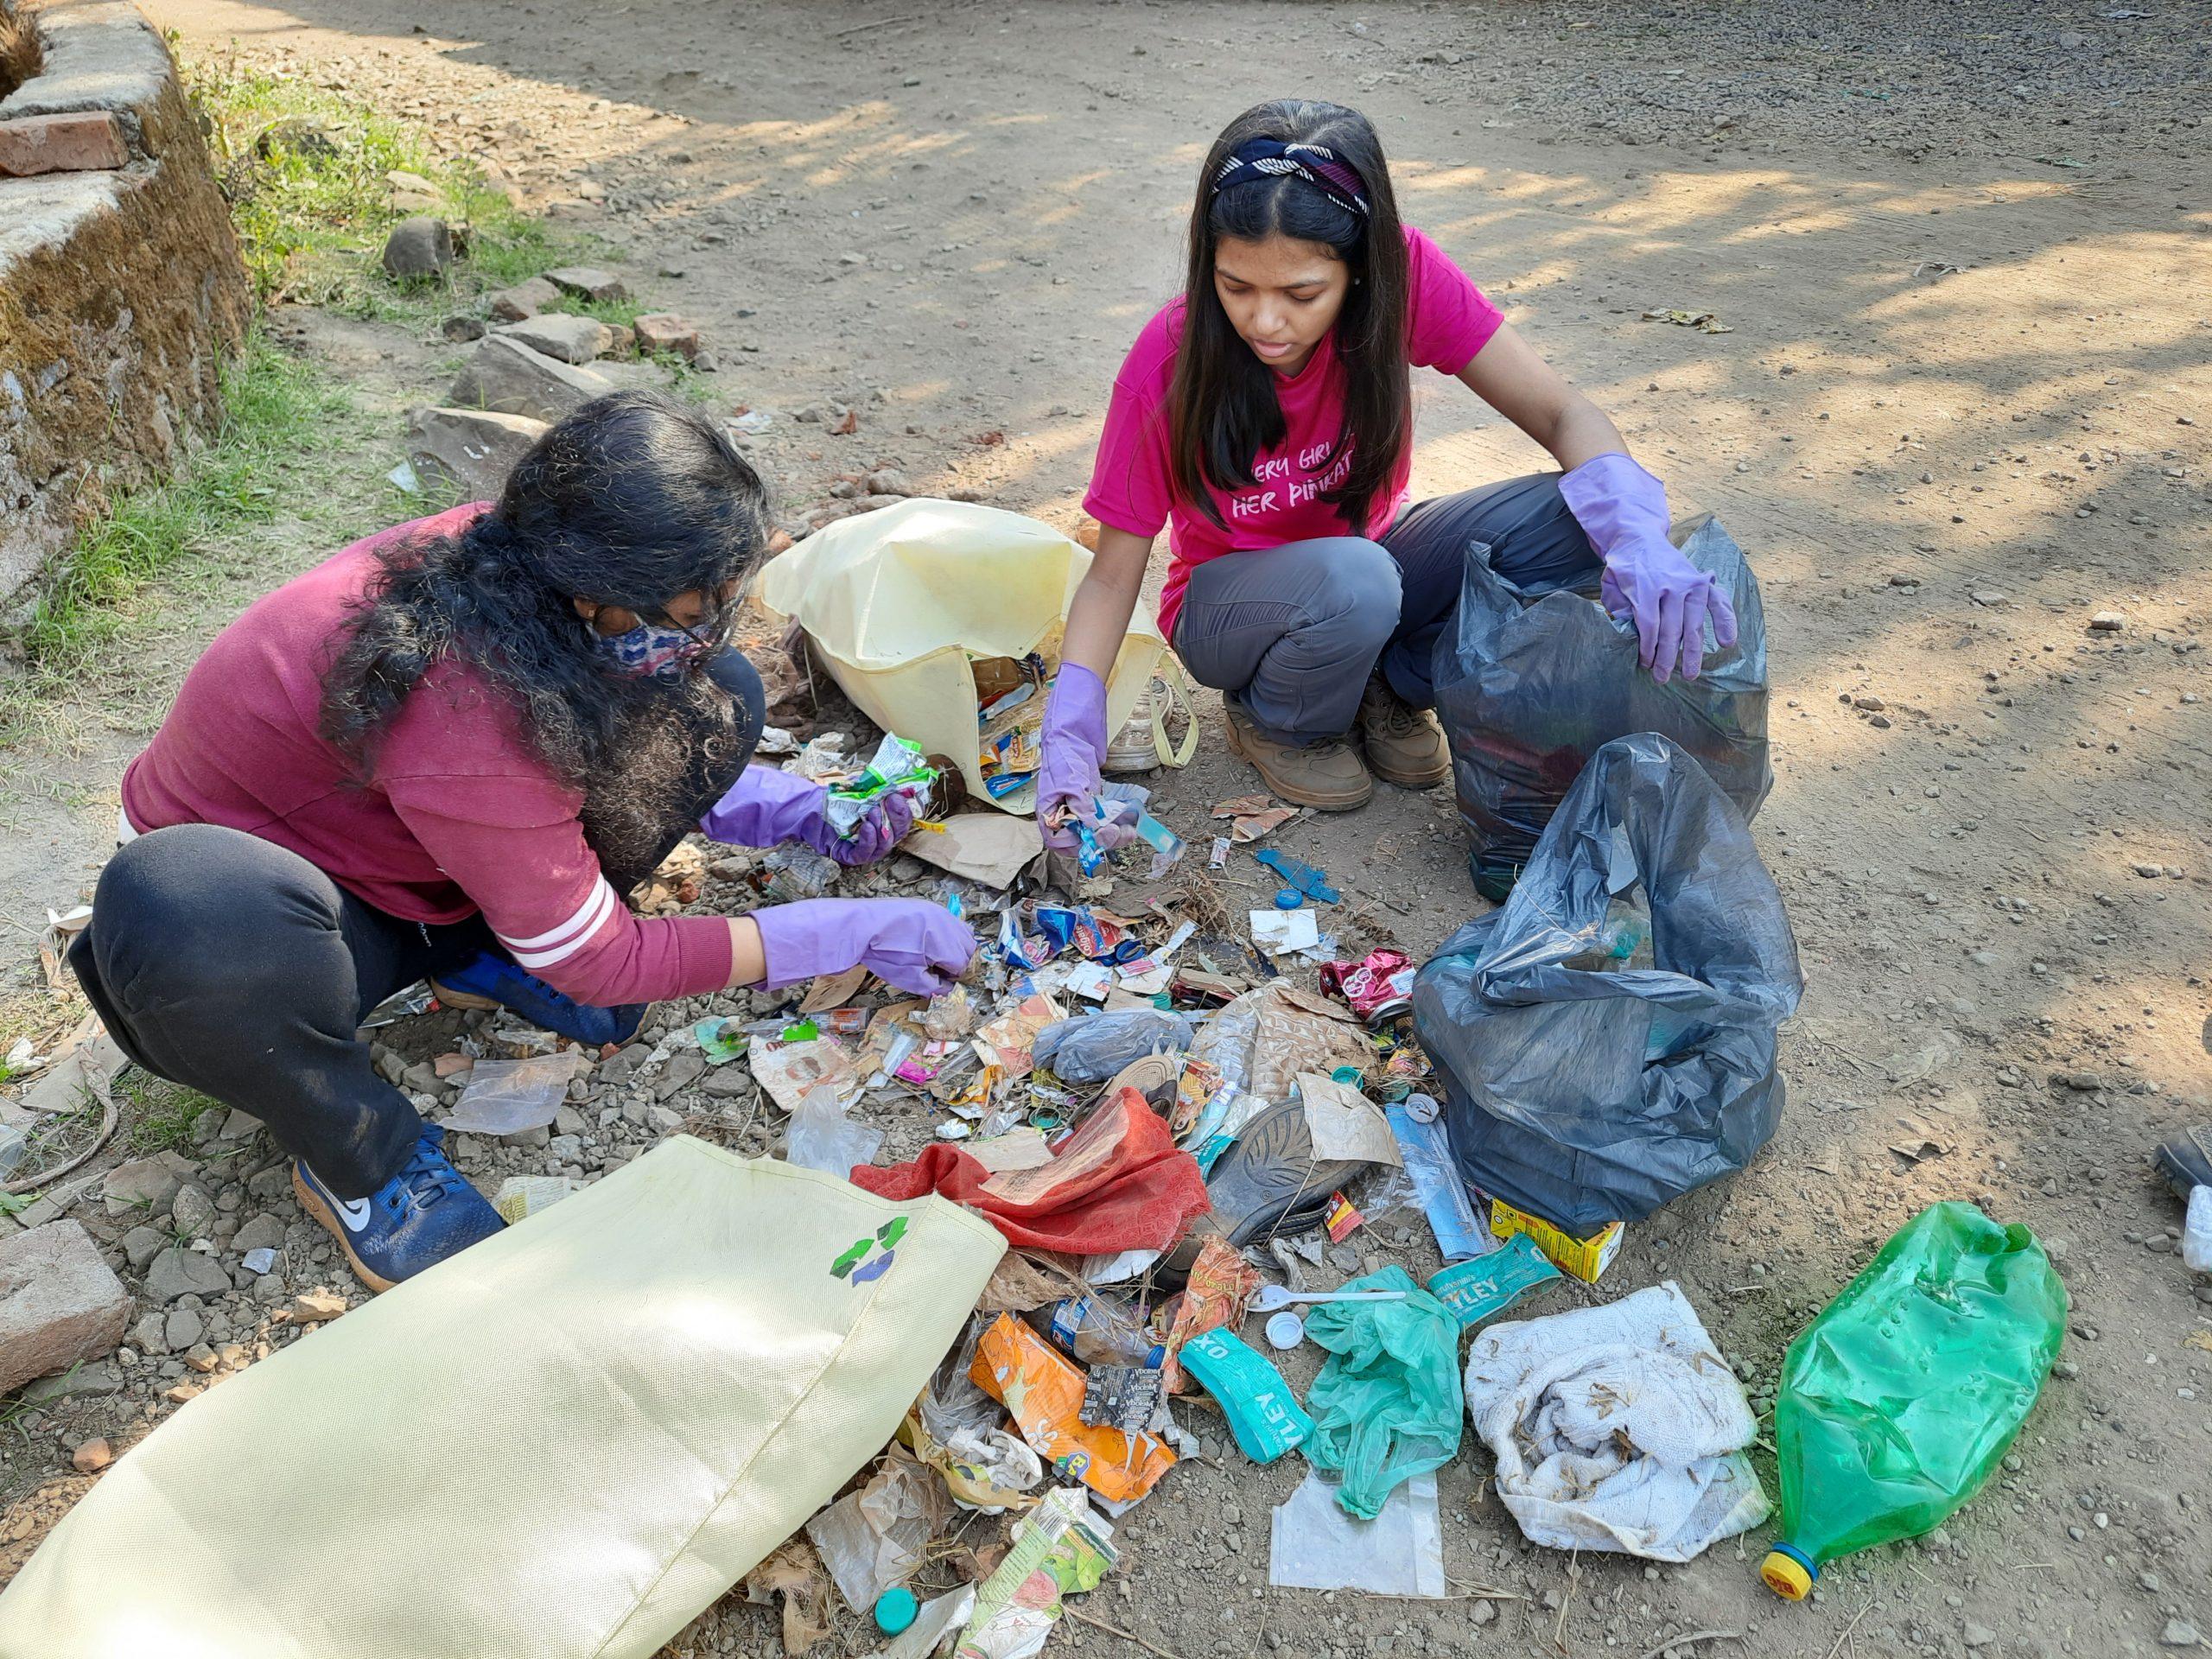 ecopurple-trek-for-nature-kalsubai-clean-up-trek